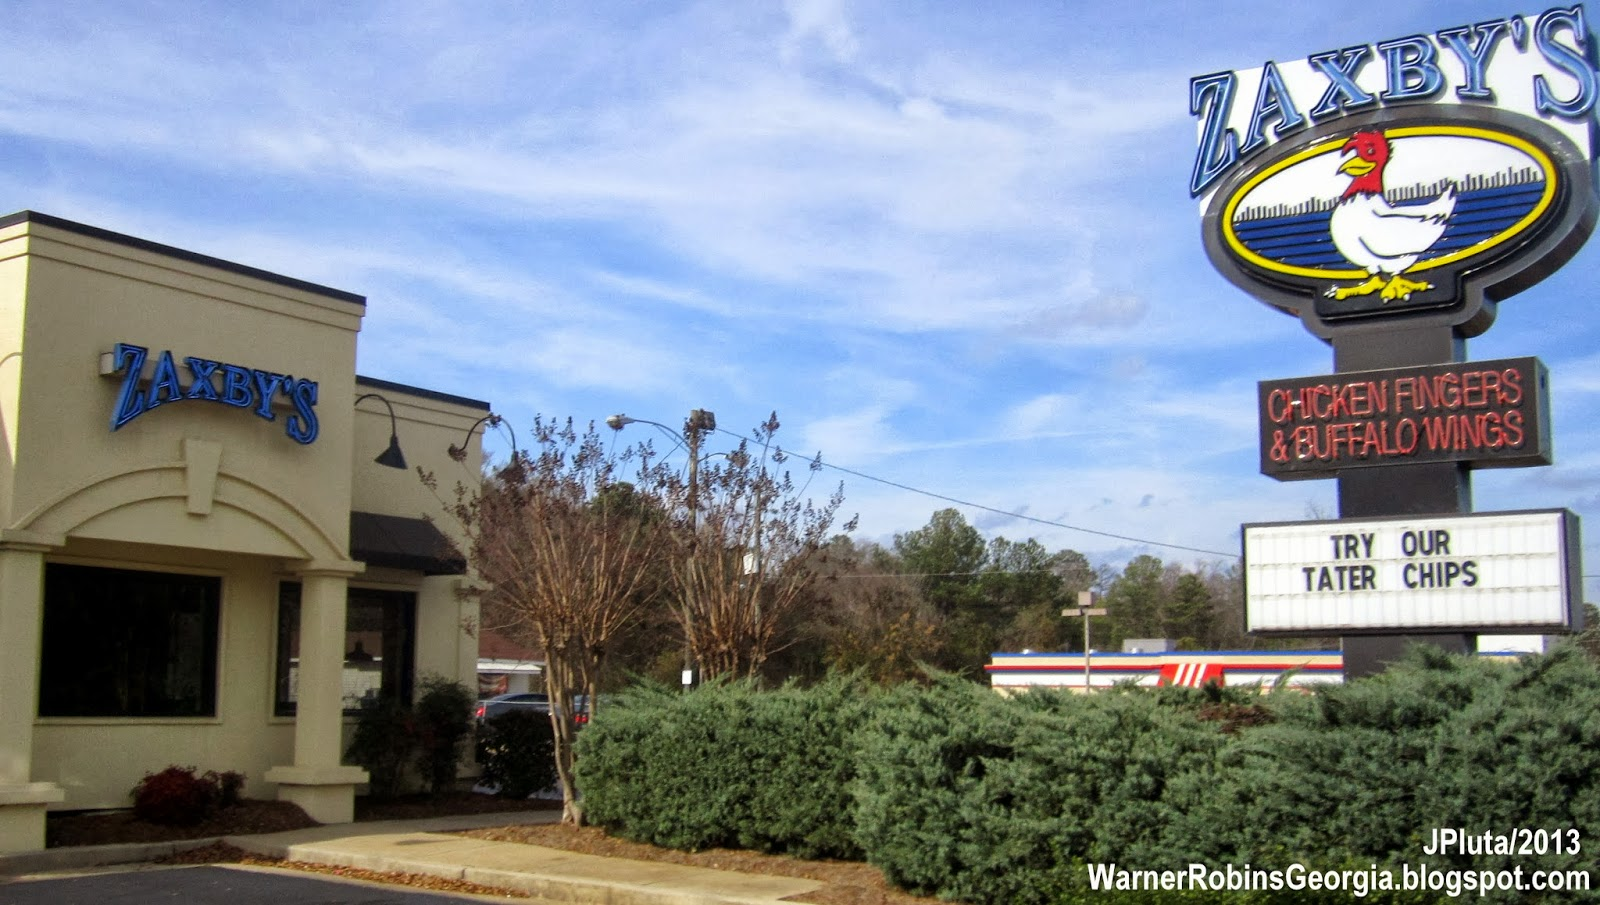 Warner Robins Georgia Air Force Base Houston Restaurant